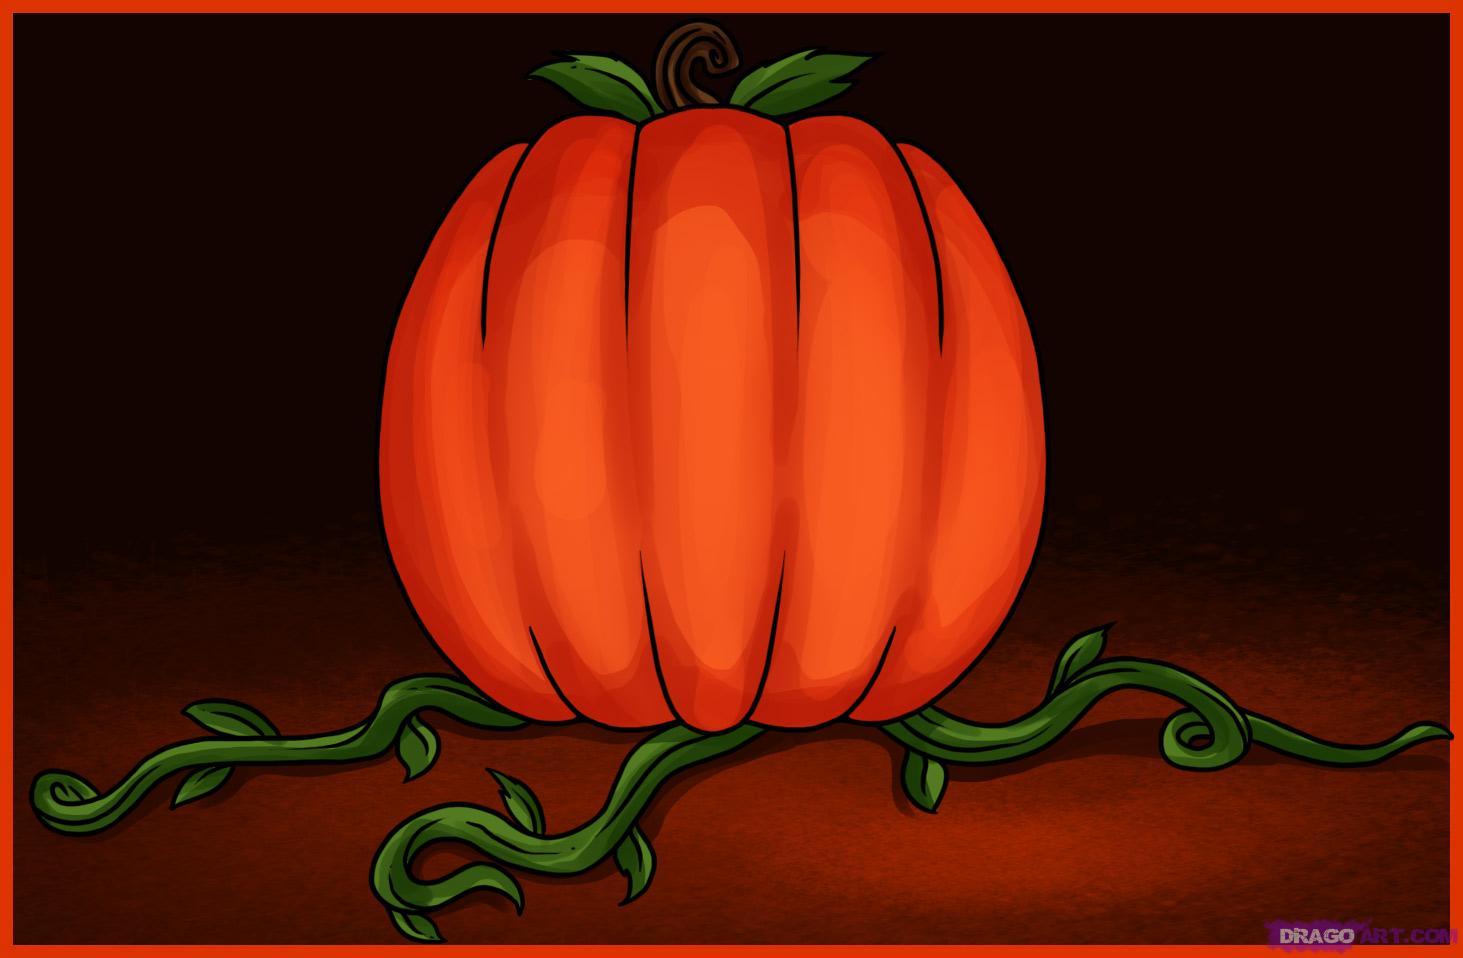 Drawn pumpkin cinderella pumpkin By How Step to draw